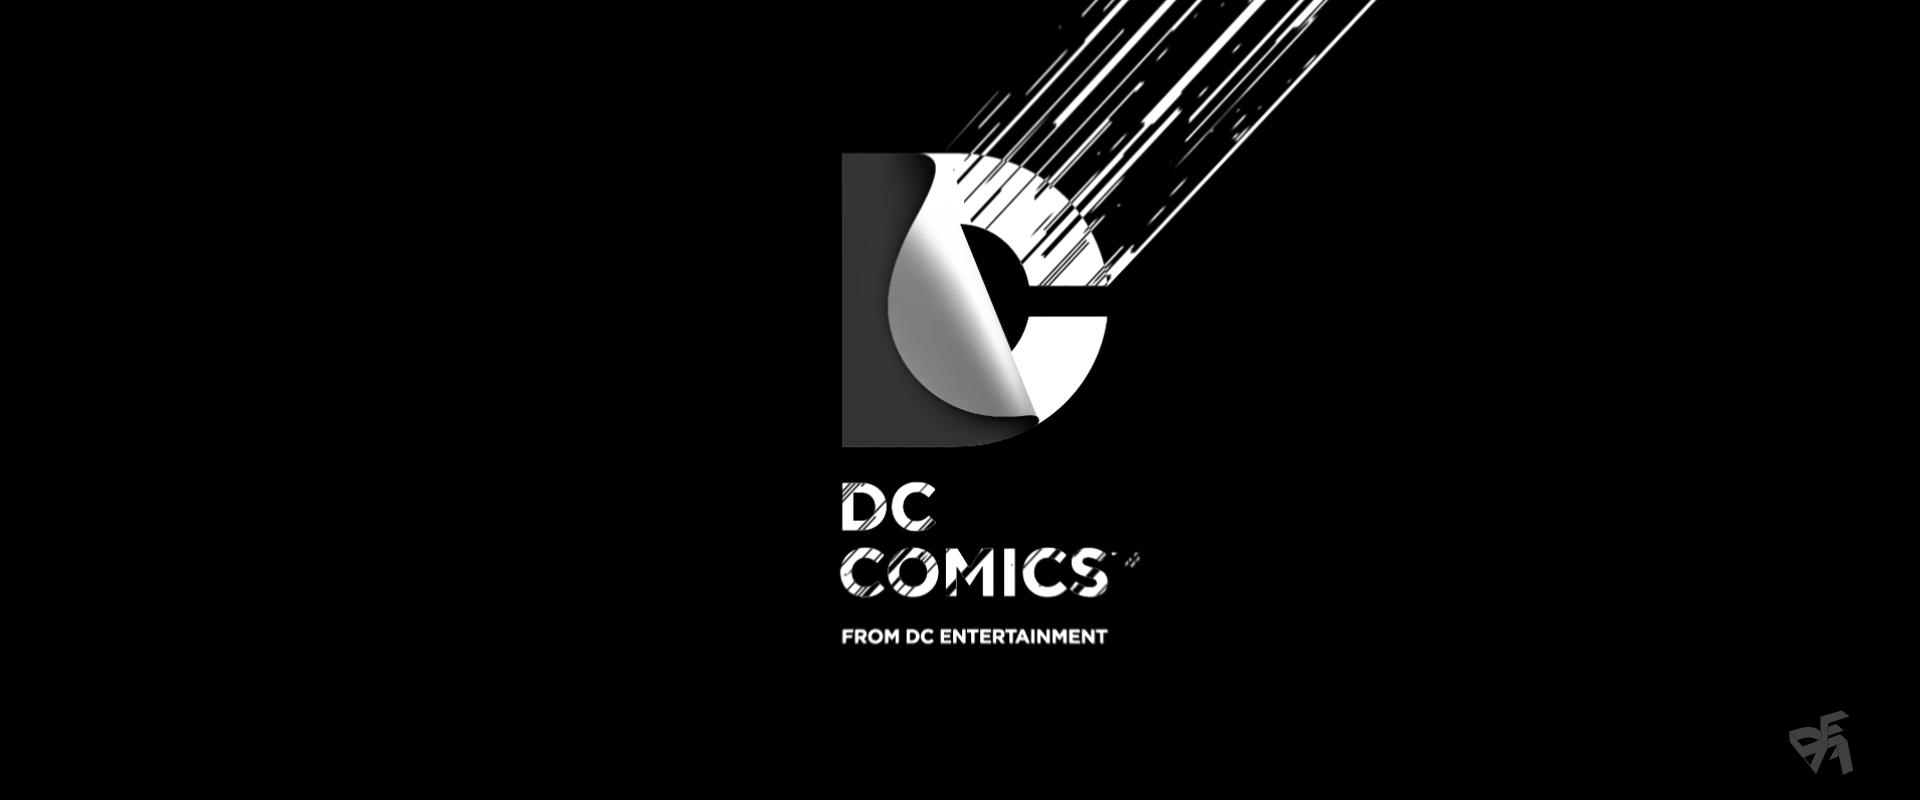 DC_STORYBOARD1_07.jpg